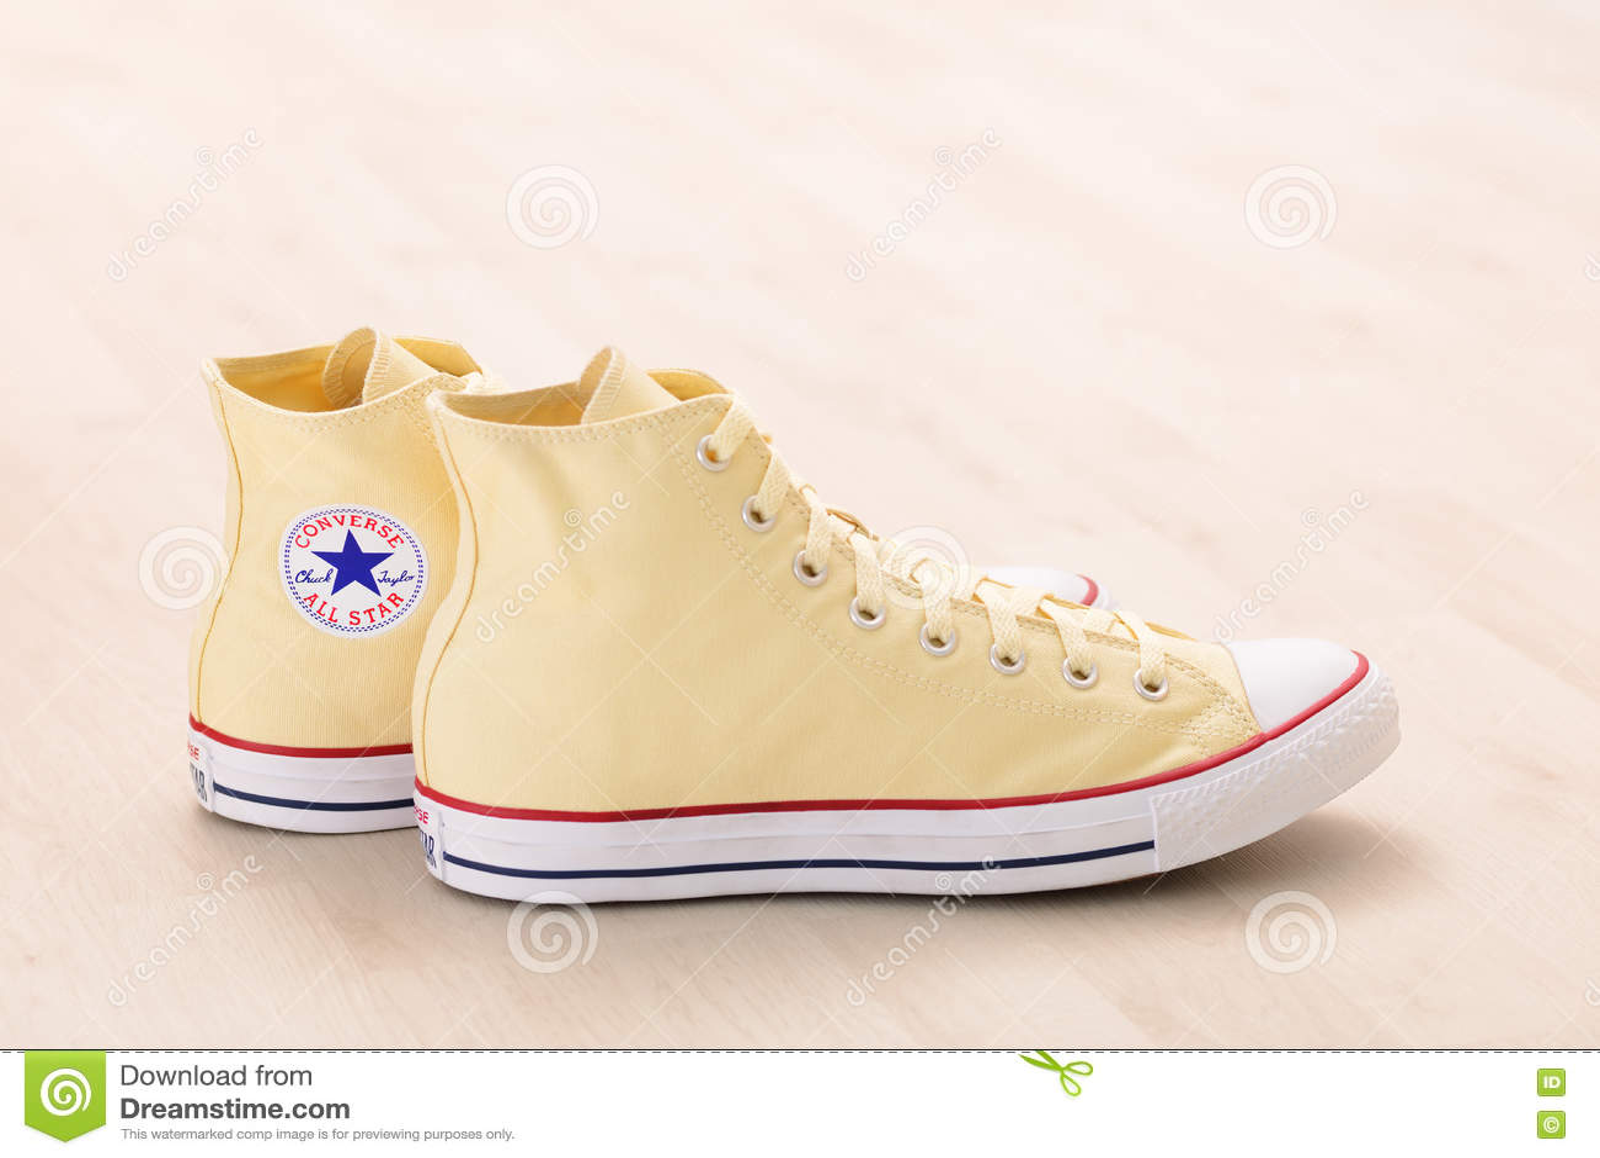 chaussure converse brest